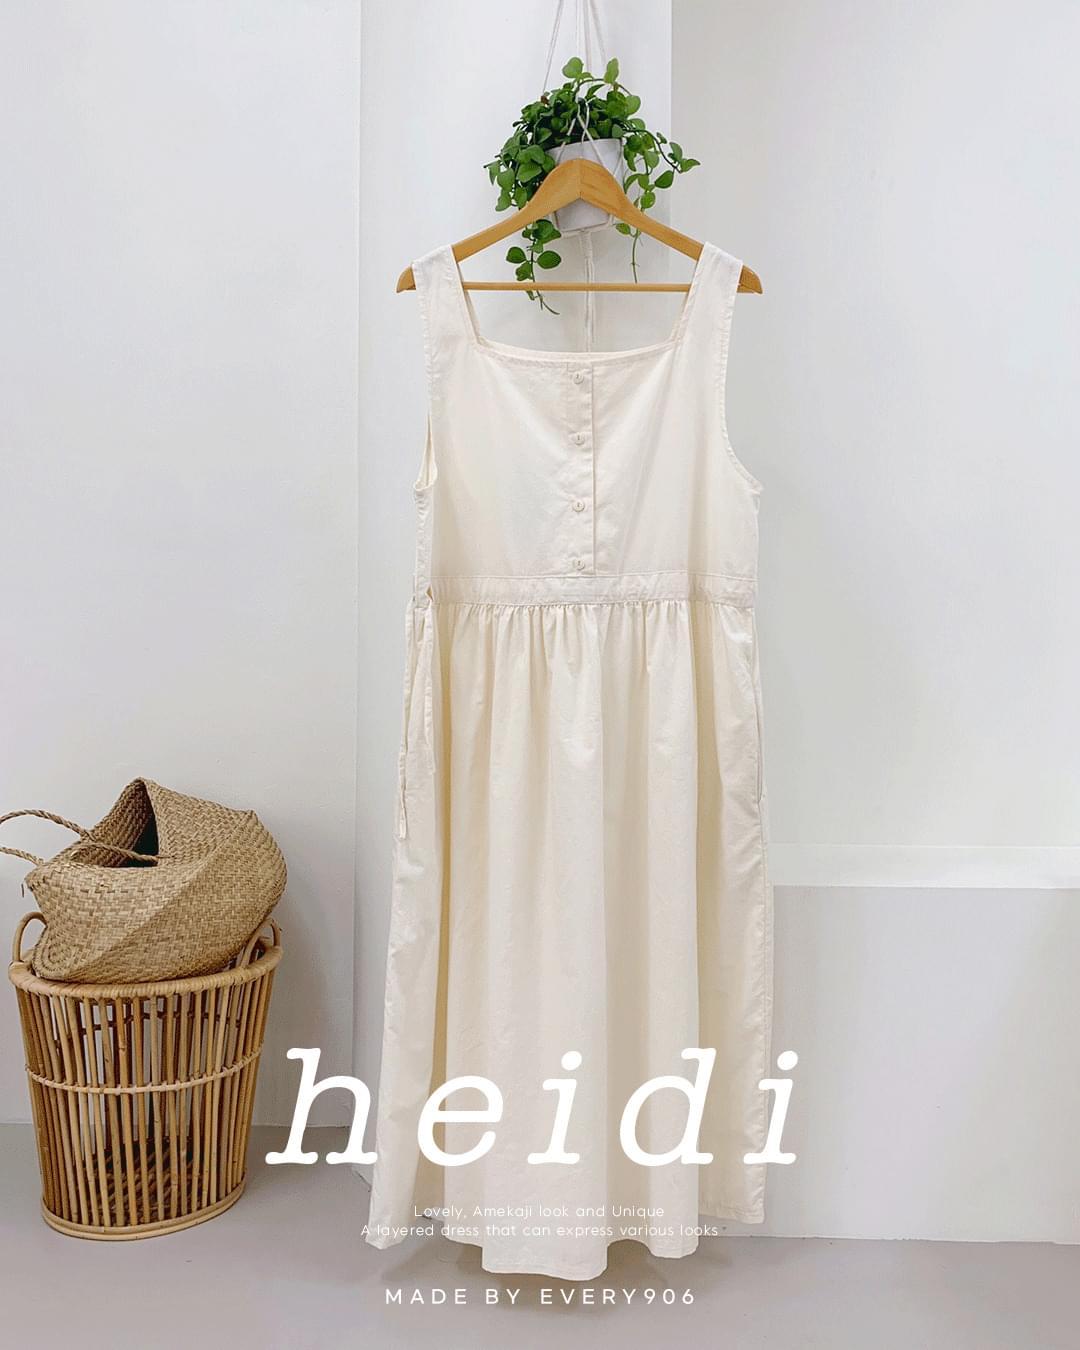 Heidi long Dress